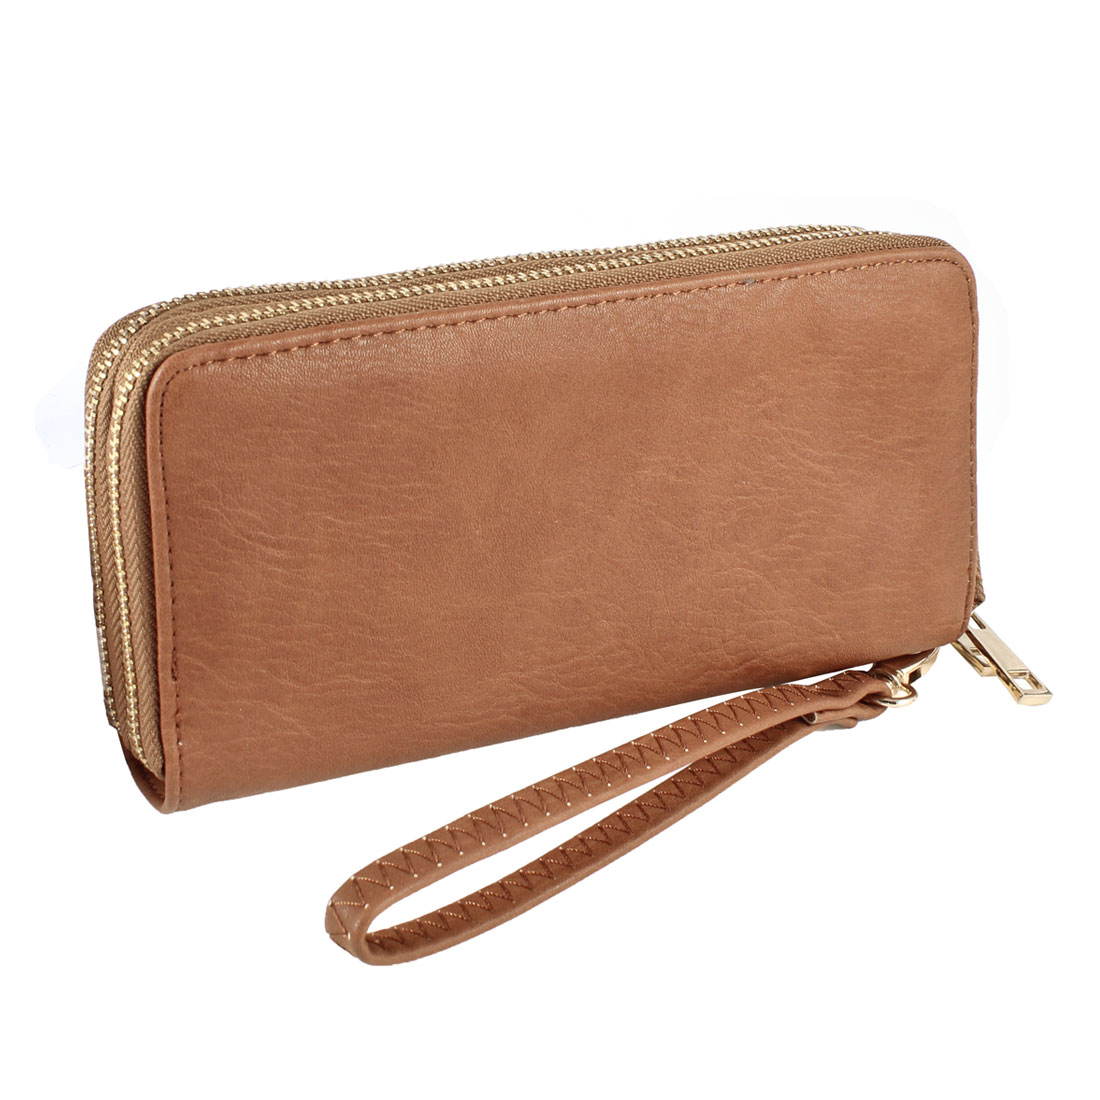 Lady Brown Faux Leather 2 Layers Zip up L-Shape Wrist Strap Wallet Purse